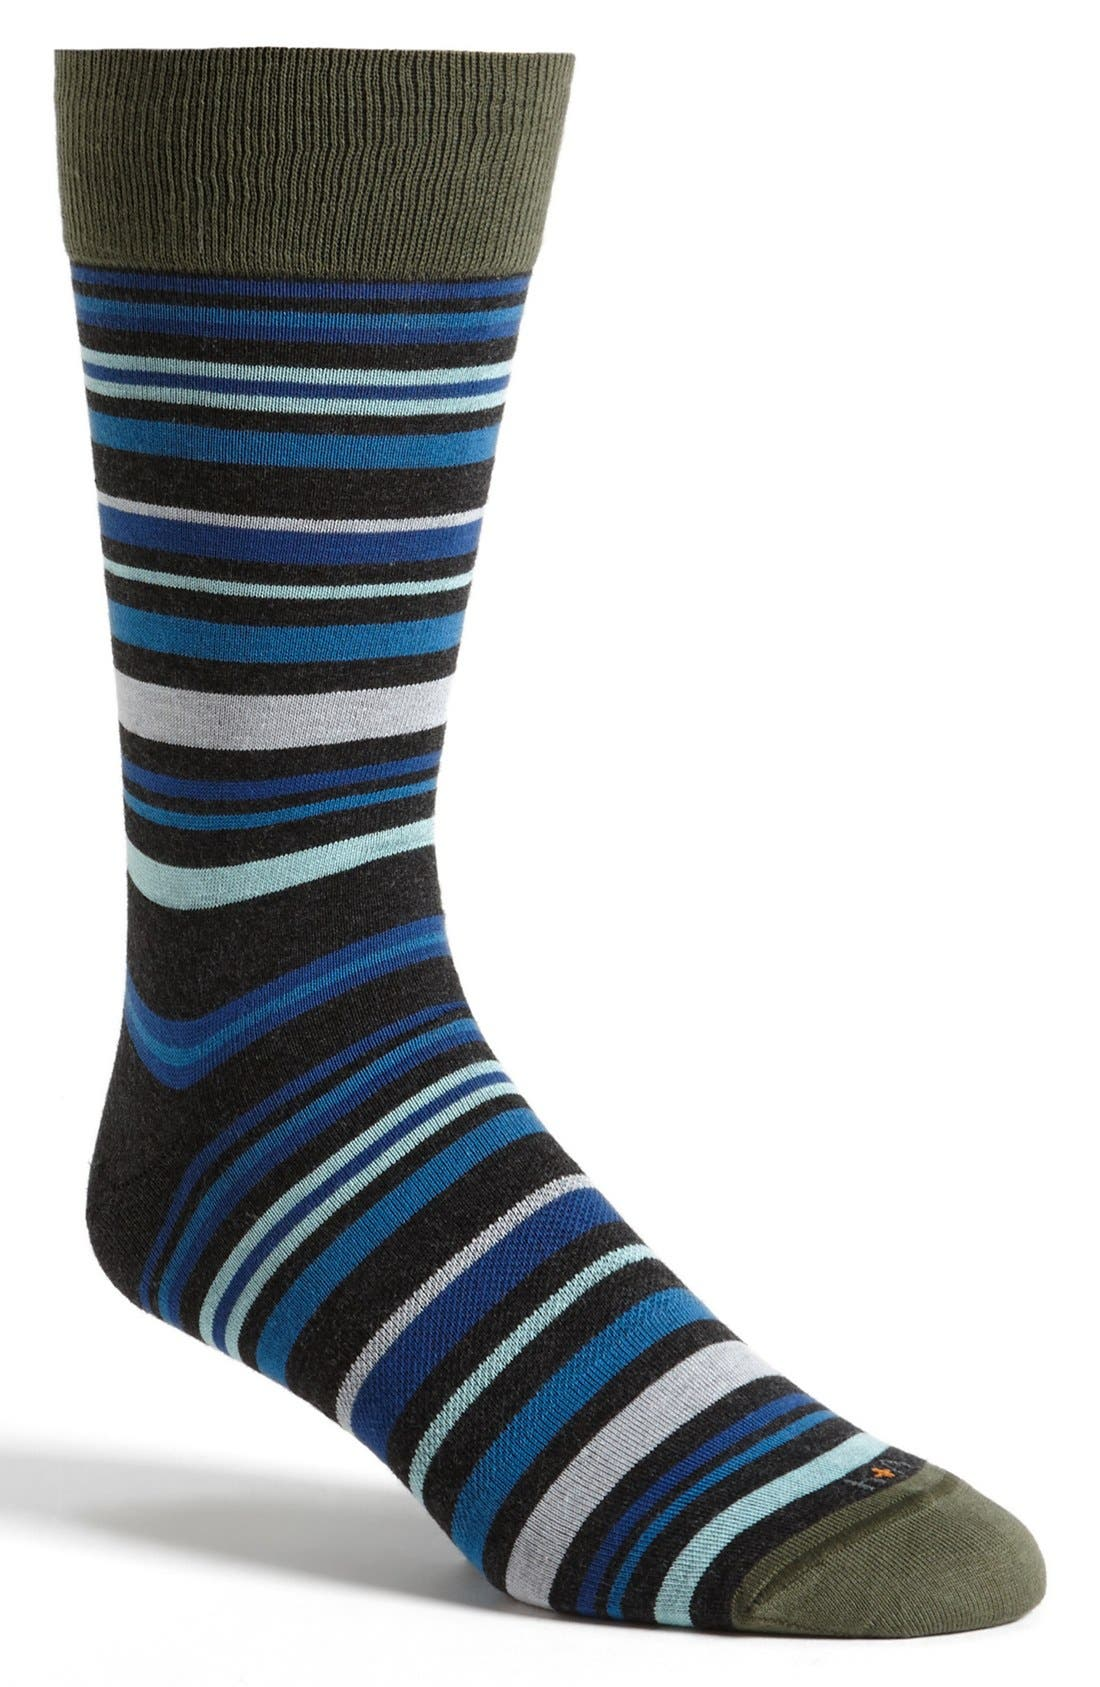 Alternate Image 1 Selected - hook + ALBERT 'Stratum' Socks